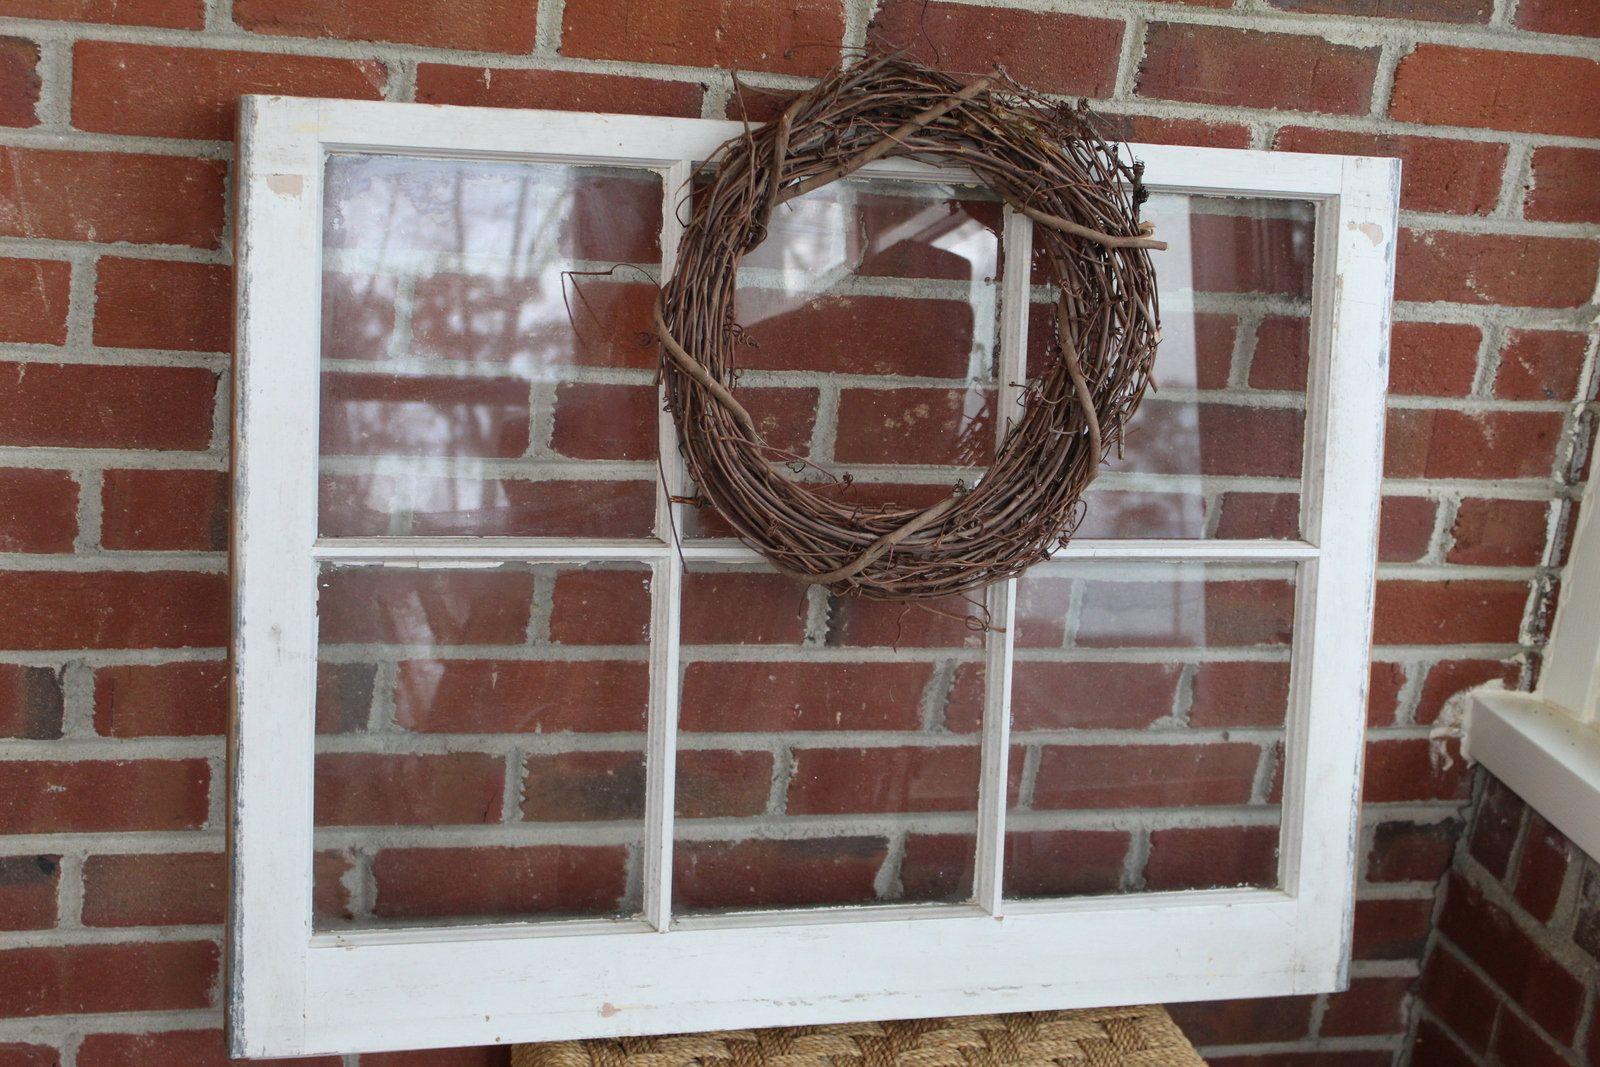 Vintage Large Wooden Window Pane Frame Painted 6 Pane Window With Glass By Creeklifetreasures Wood Window Oldwindow Diy Wood Framed Mirror Old Wood Faux Wood Tiles